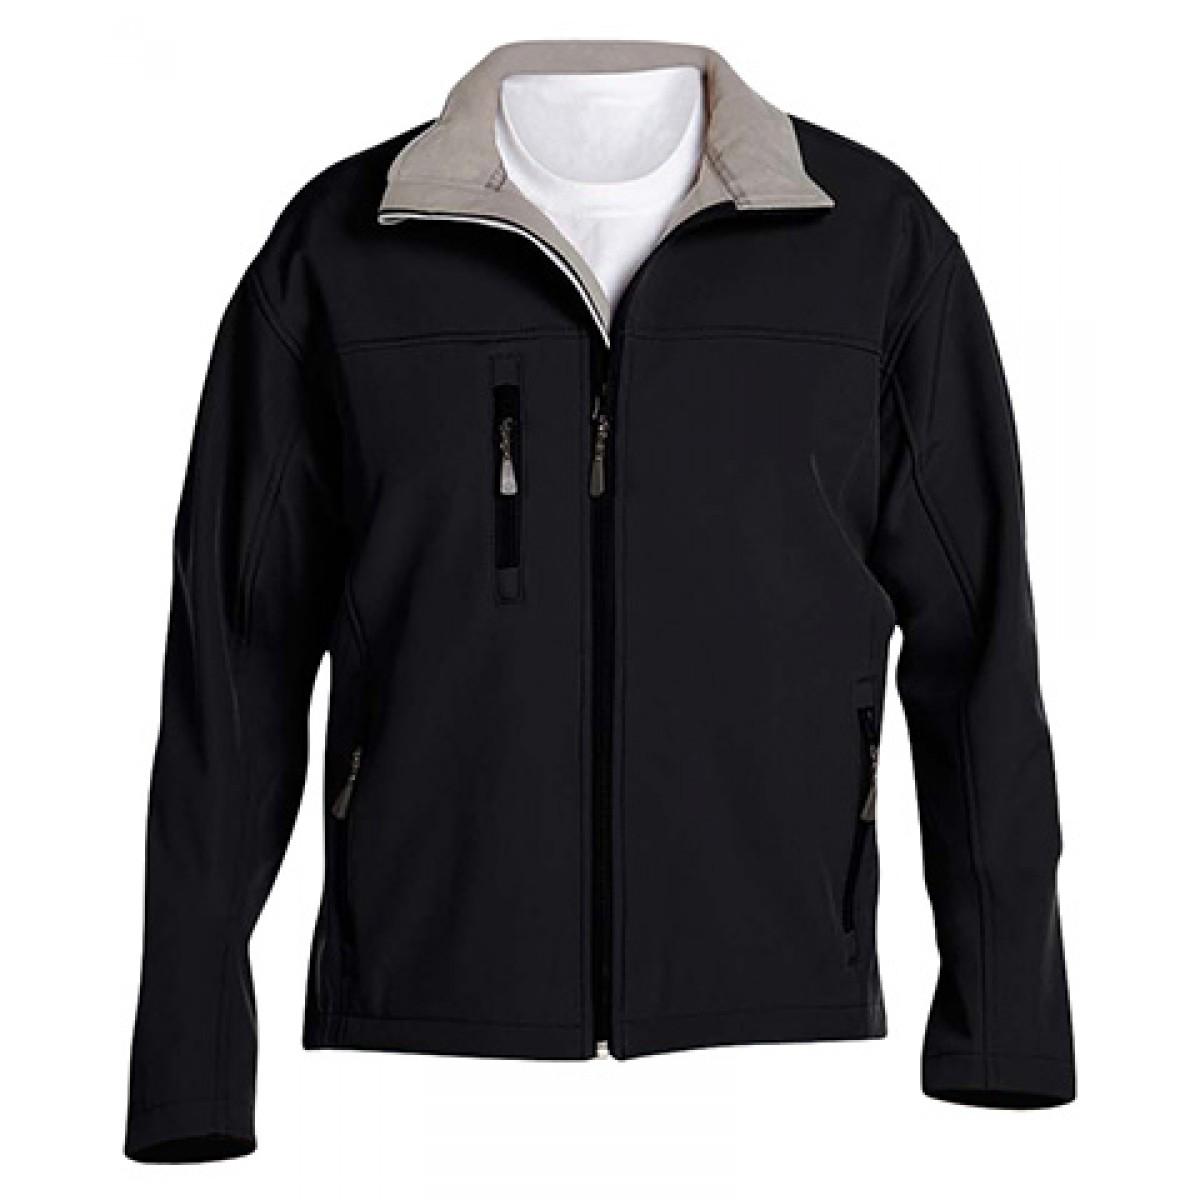 Men's Soft Shell Jacket-Black-XL